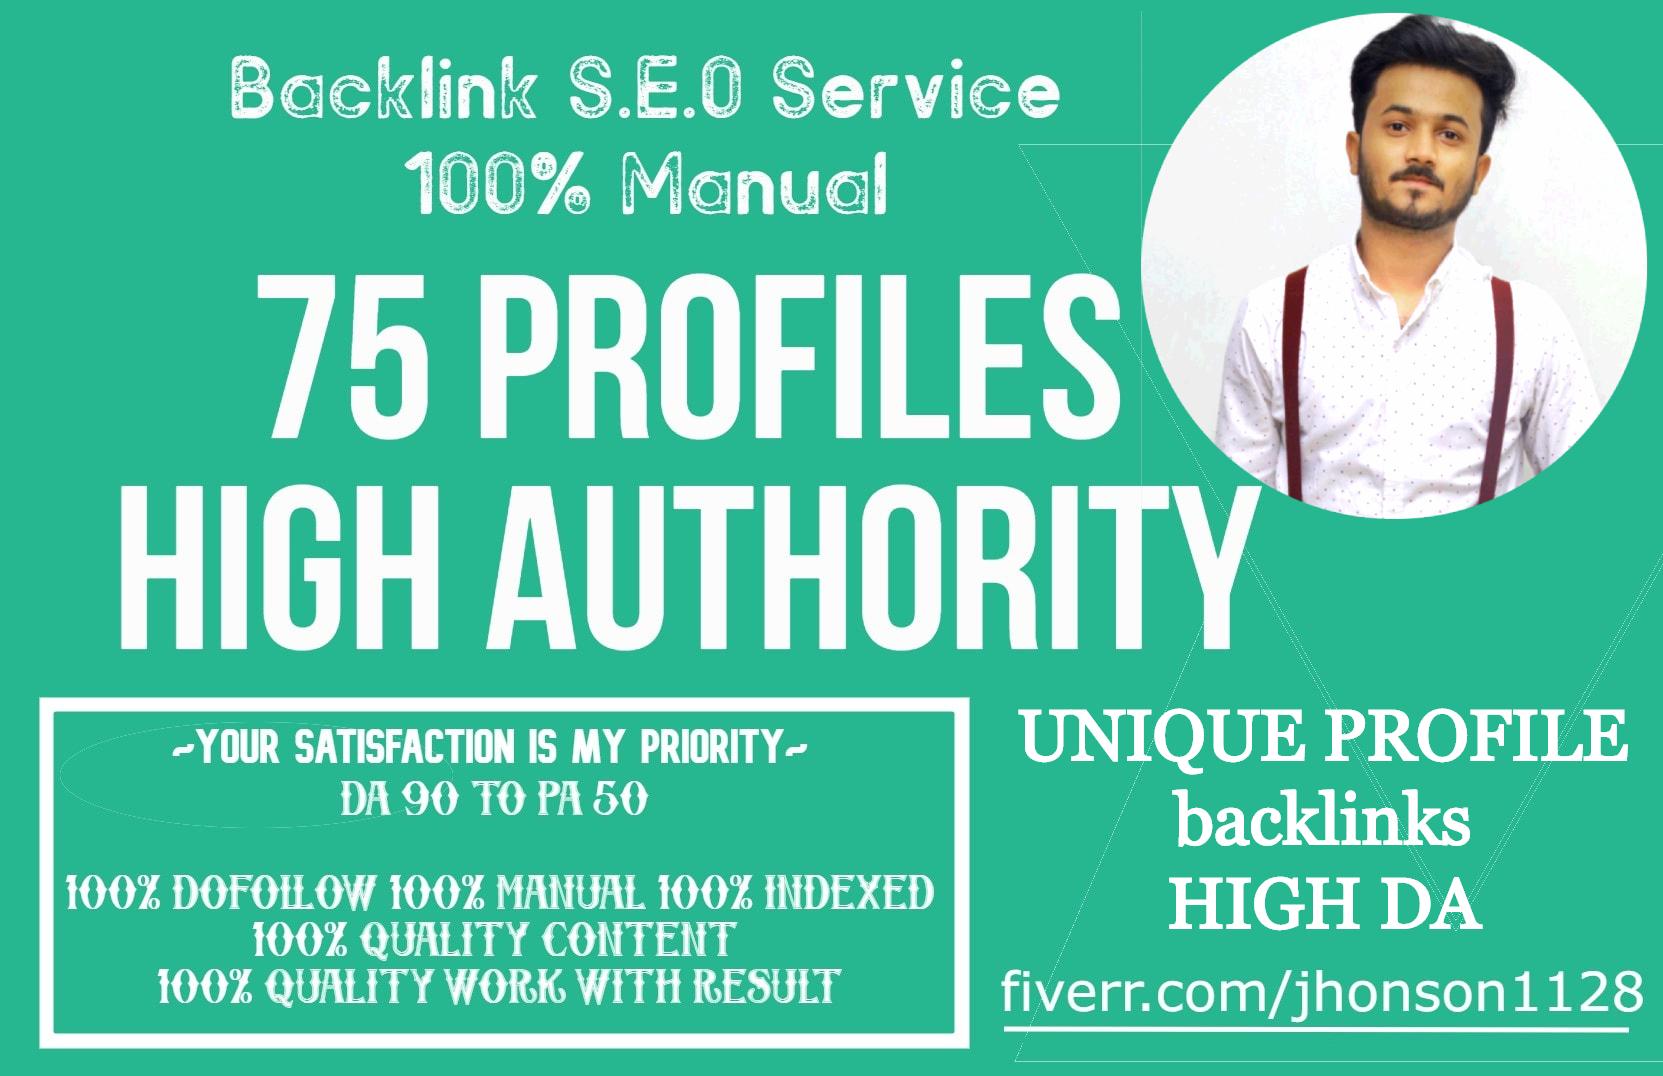 I will do high authority 75 profile backlinks da100 and tf50